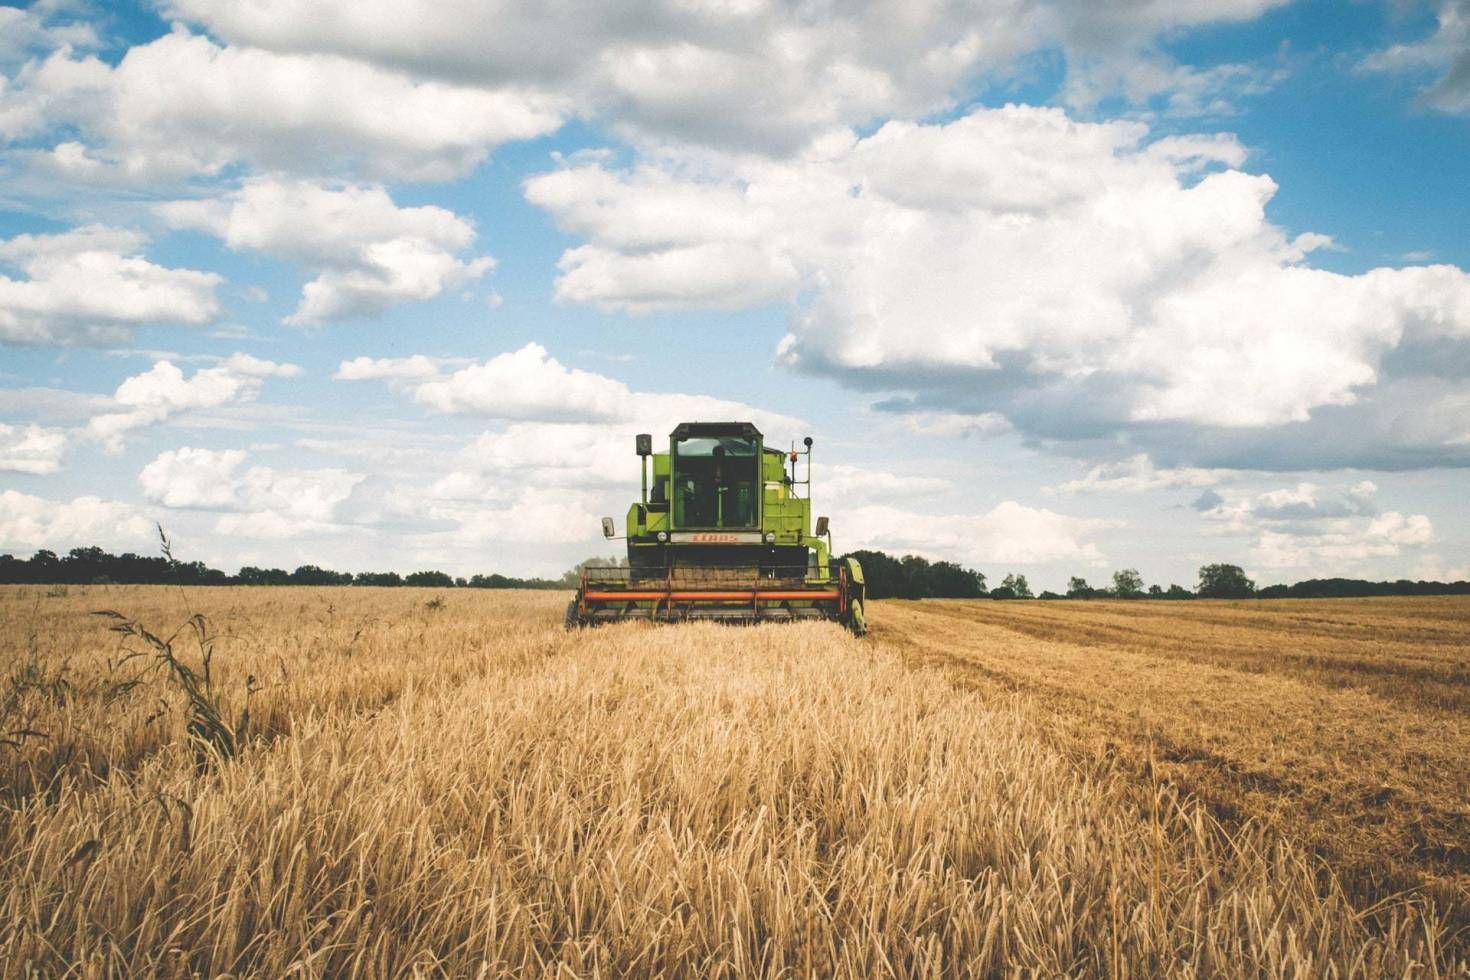 Harvesting Farmland